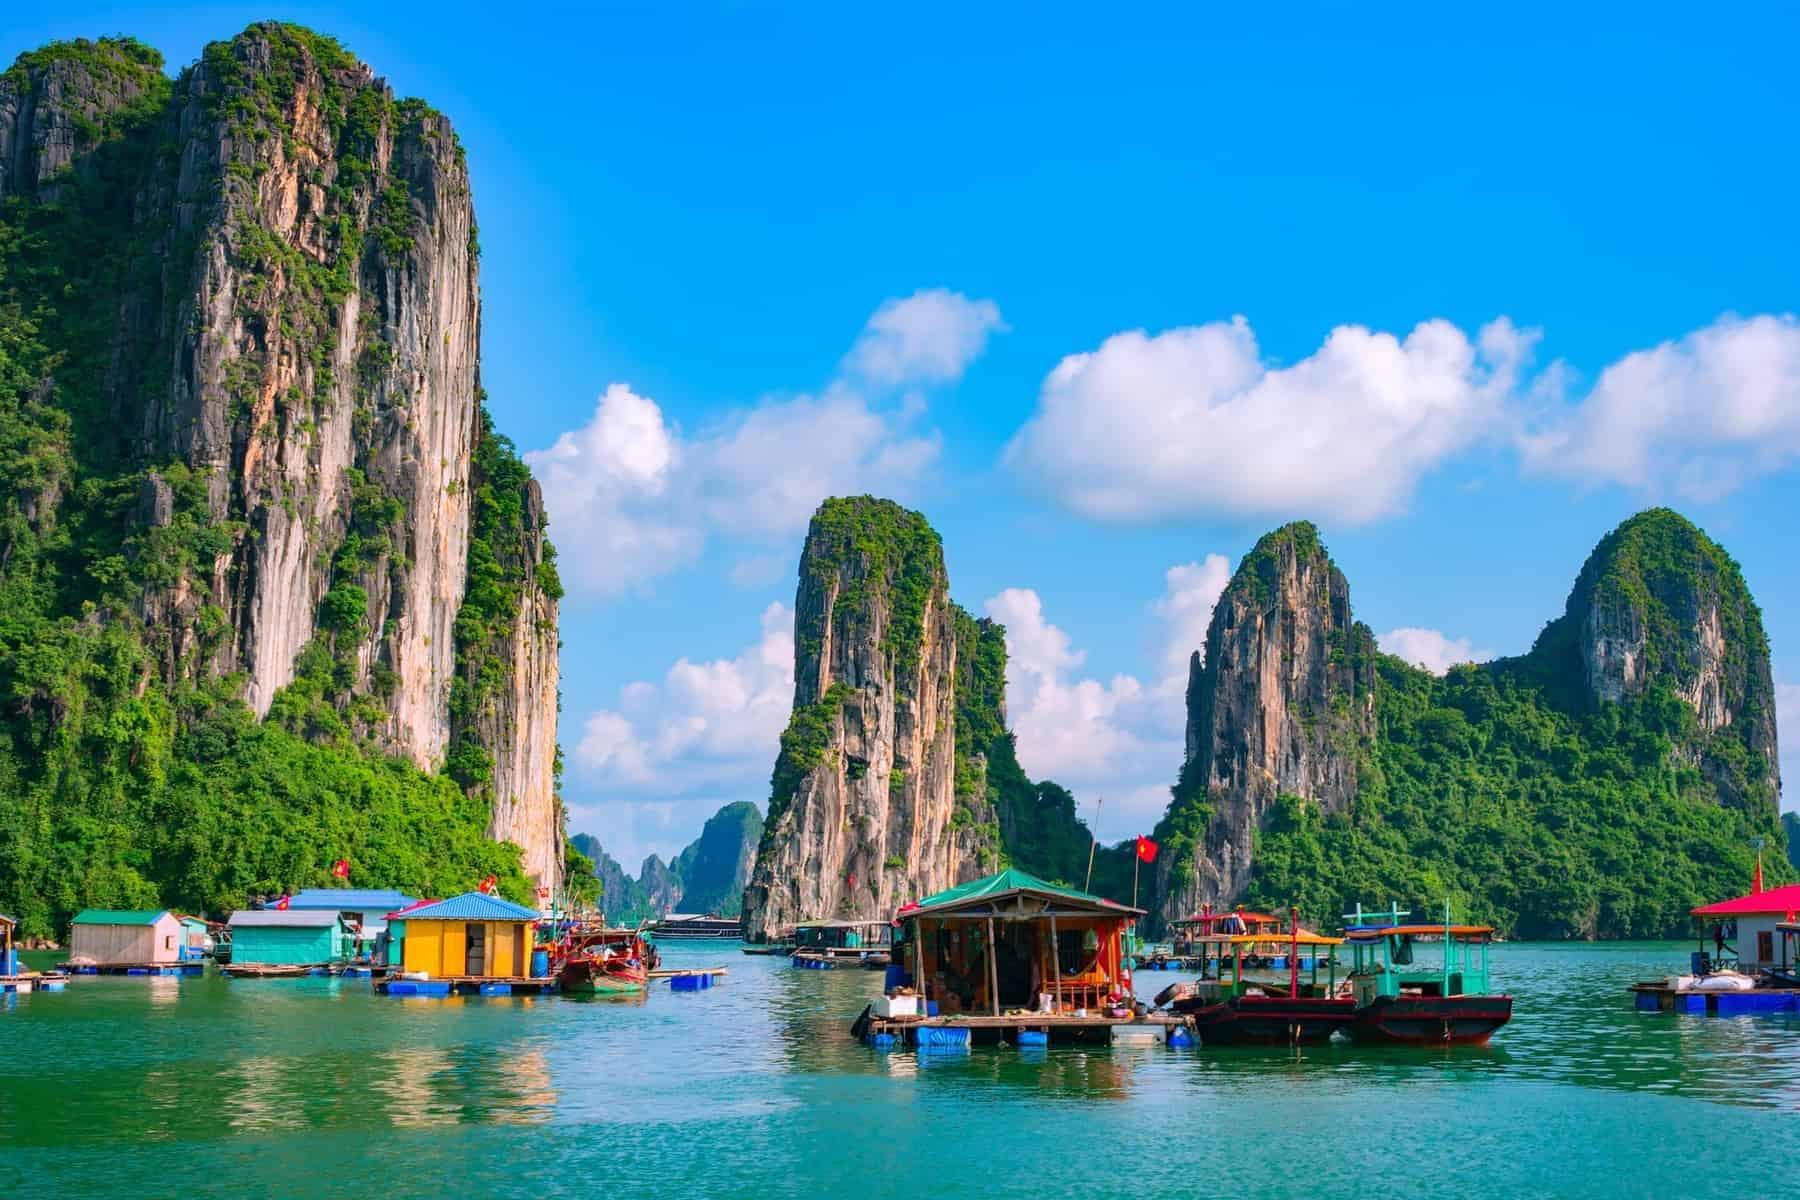 Topas Travel i Vietnam. Floating fishing village and rock island in Halong Bay, Vietnam, Southeast Asia. UNESCO World Heritage Site. Junk boat cruise to Ha Long Bay. Landscape. Popular landmark, famous destination of Vietnam